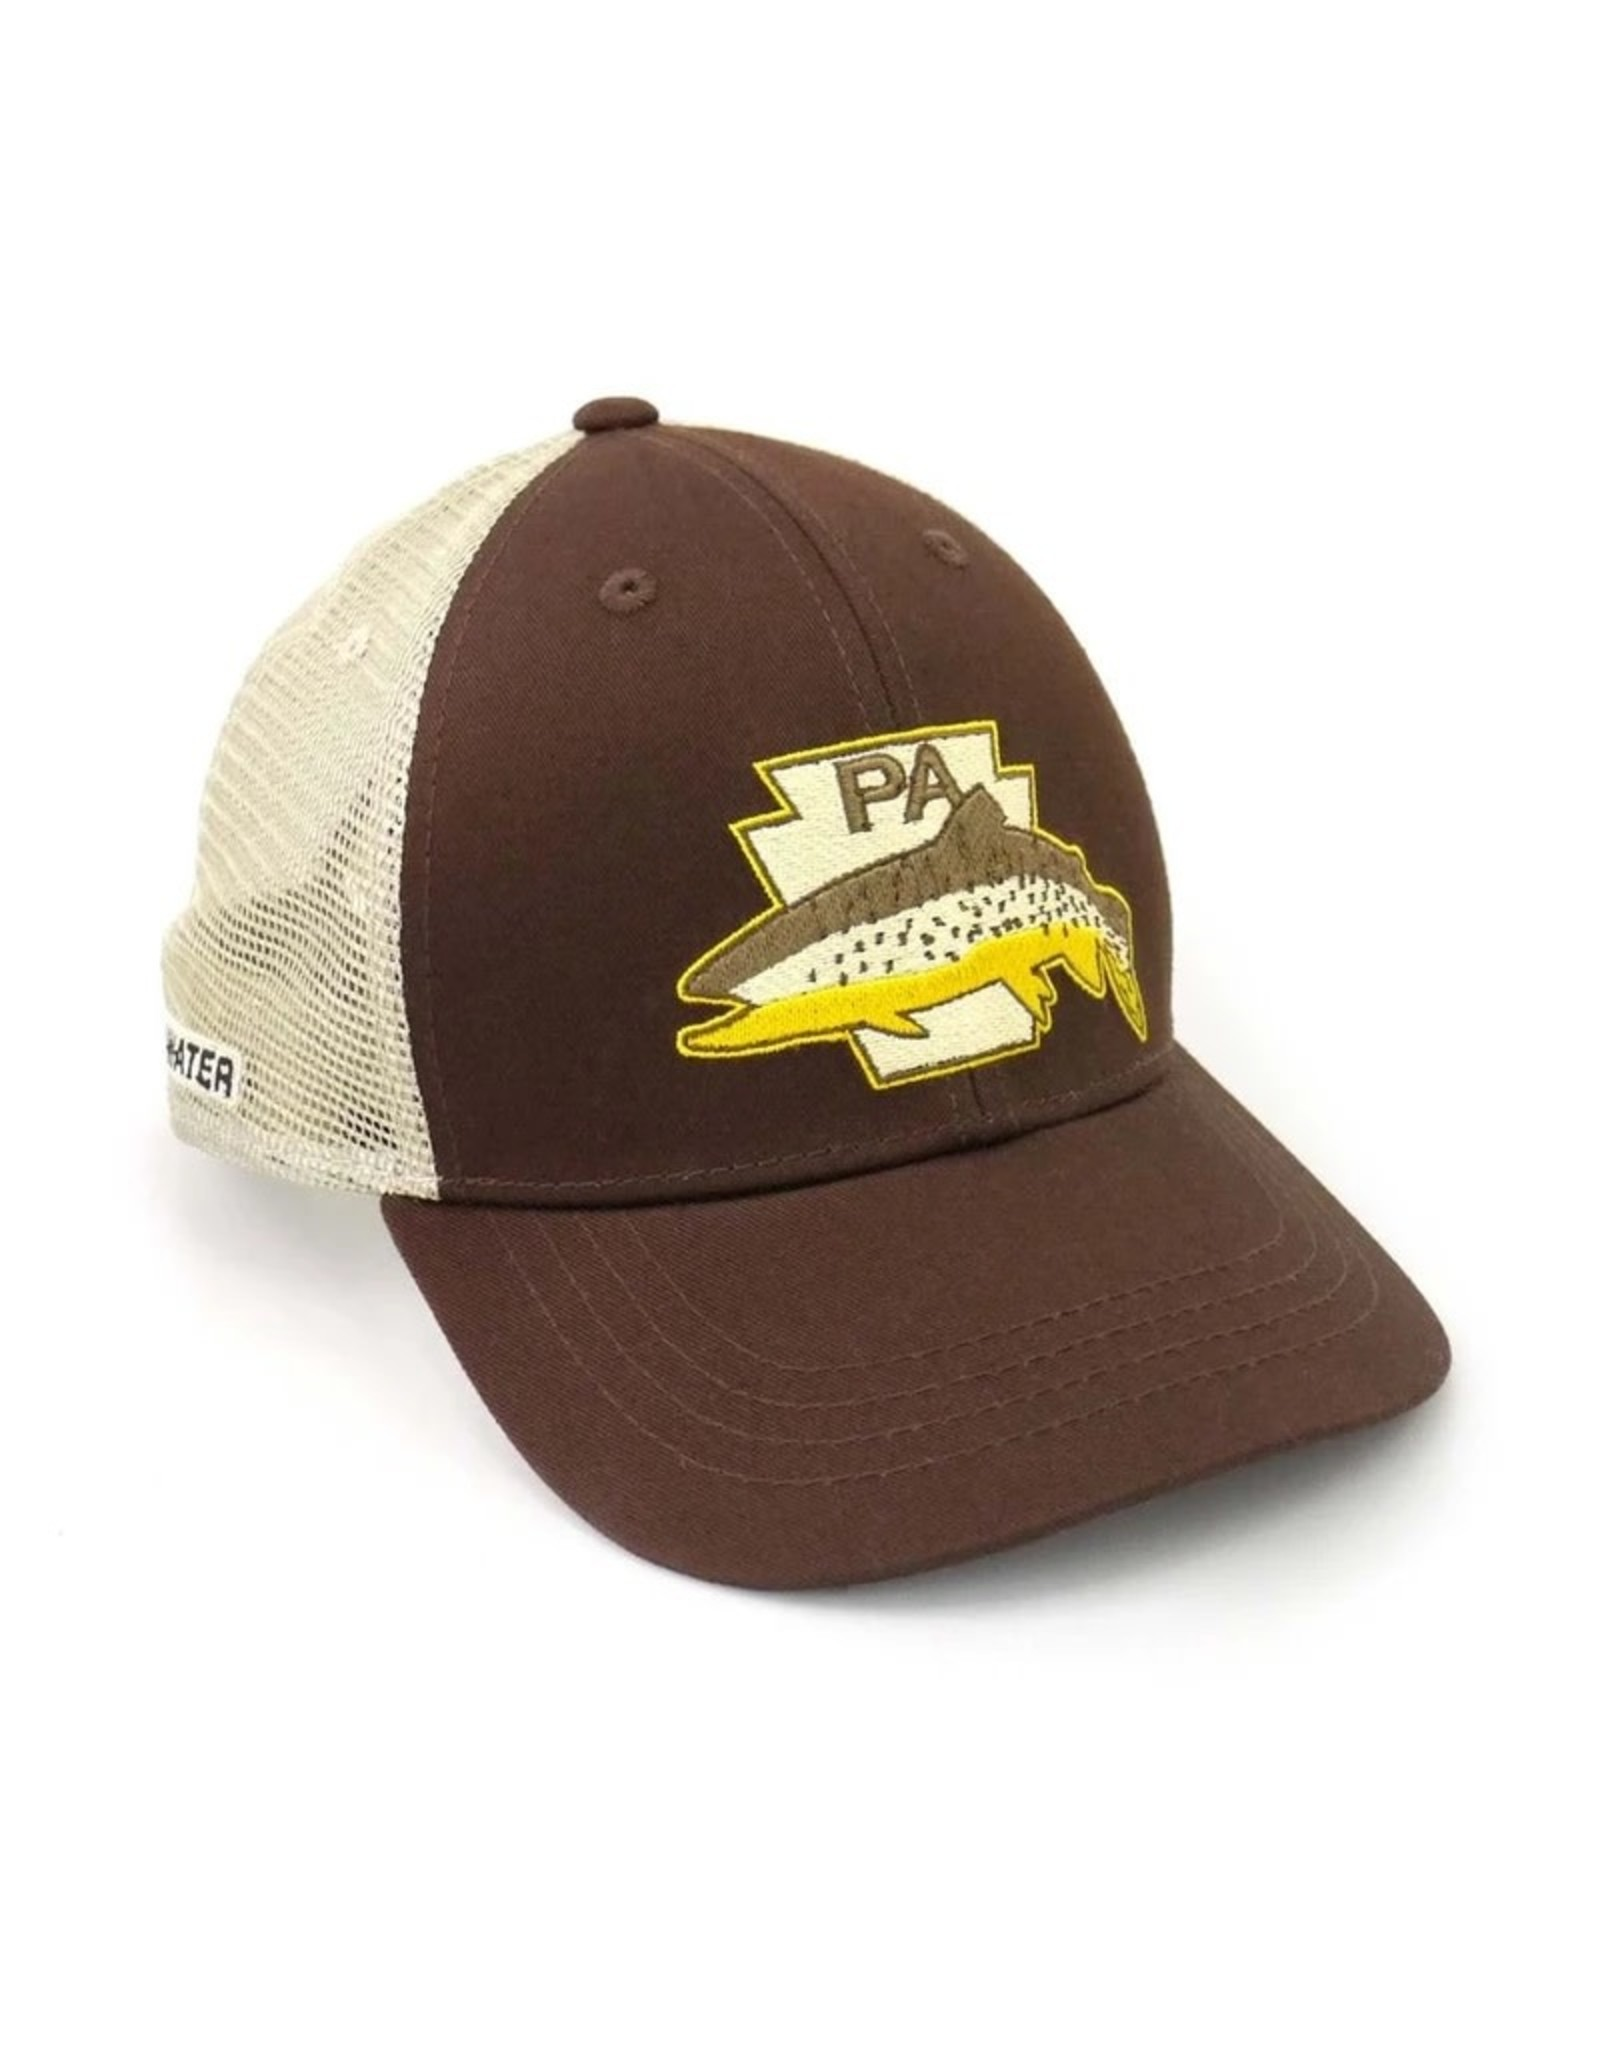 Rep Your Water Rep Your Water Pennsylvania Keystone Hat